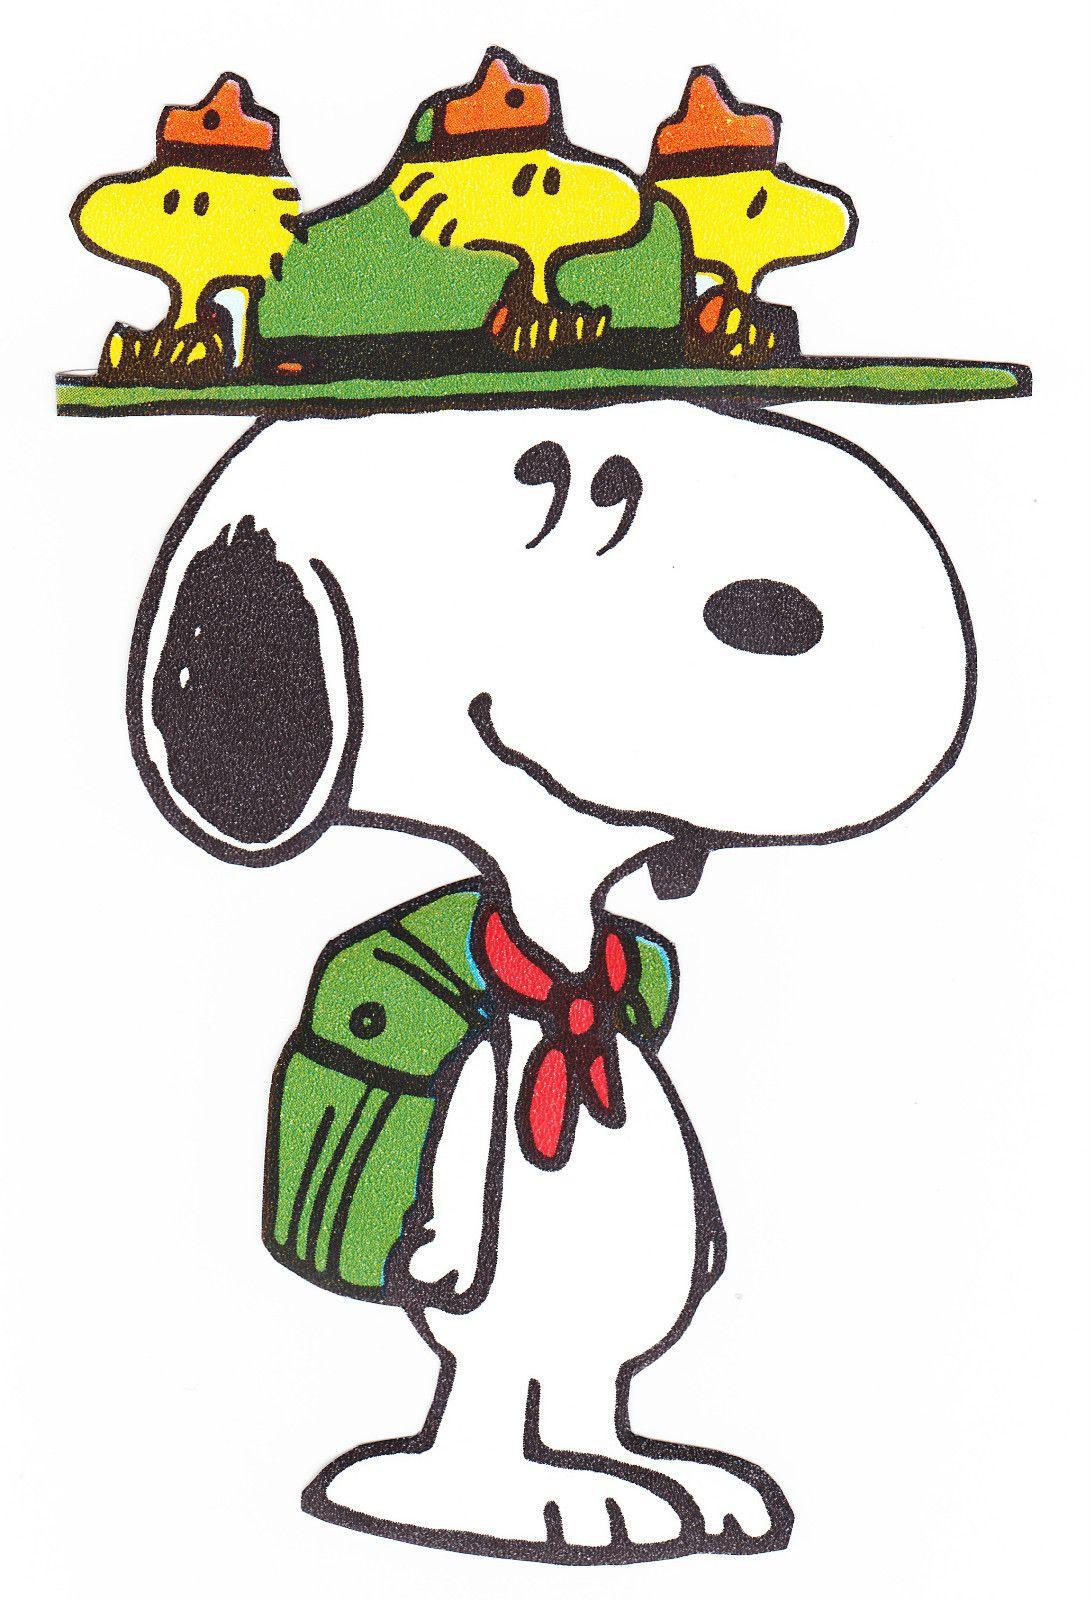 Woodstock & Snoopy.